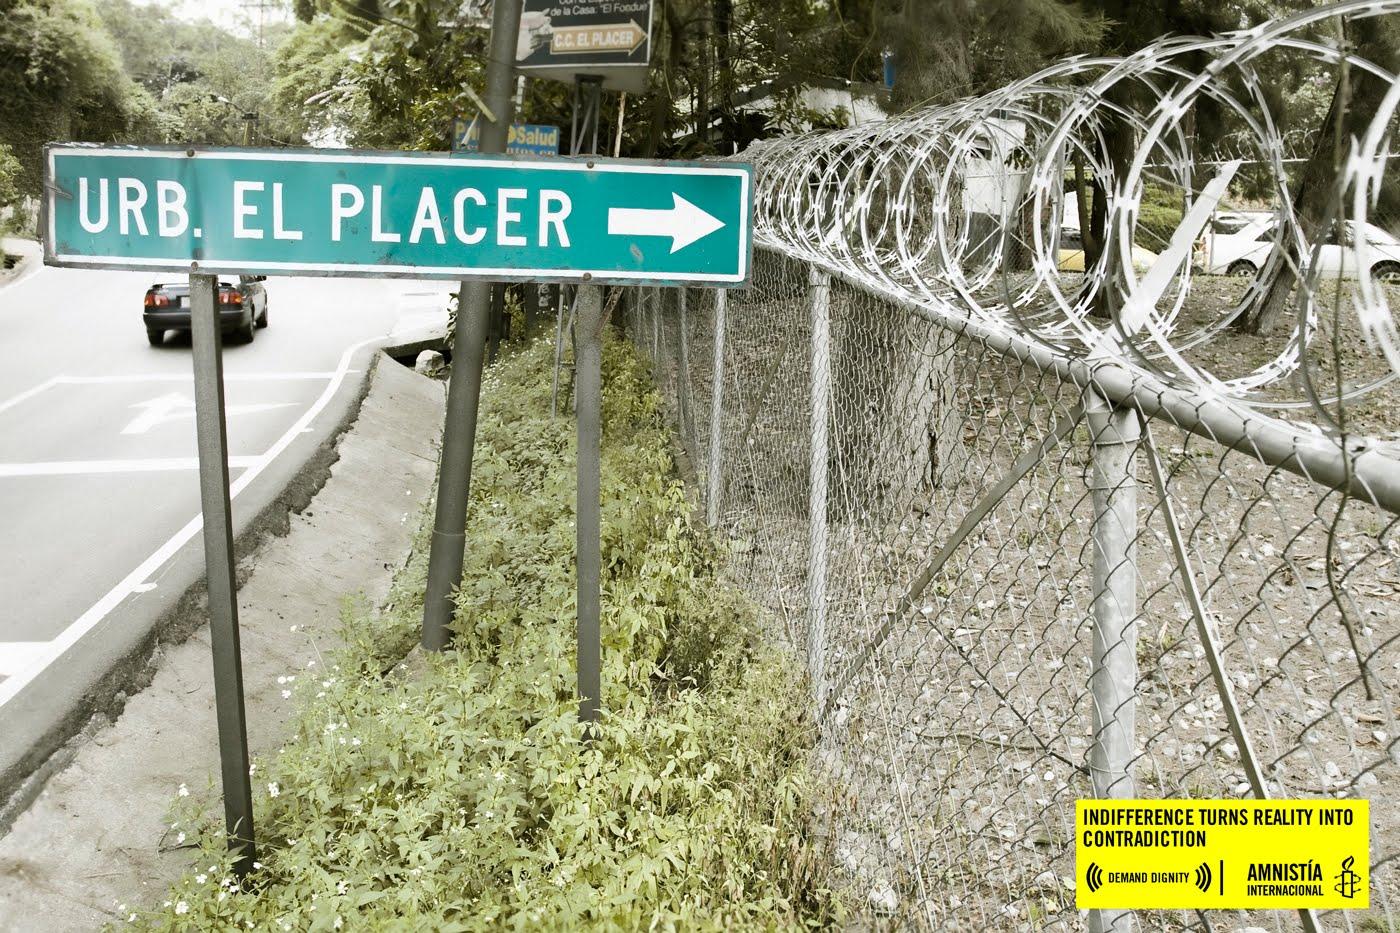 http://2.bp.blogspot.com/_b96m0hLJpBI/TIjyGtFhlUI/AAAAAAAAIzM/KjqUmOwLxS8/s1600/Amnesty+International:+Sector,+El+Placer.jpeg